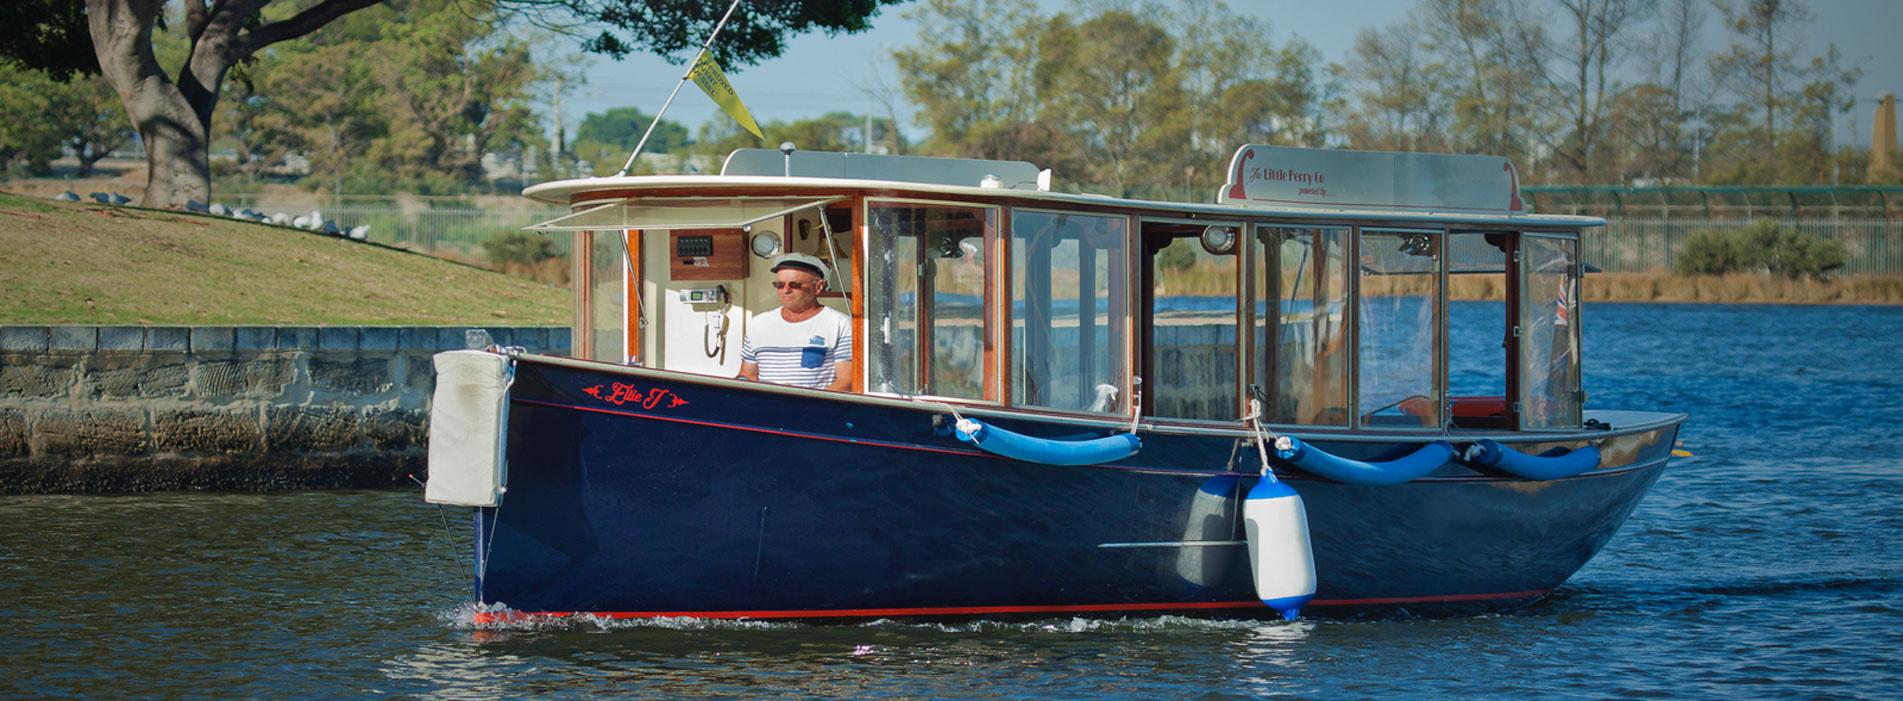 ELLIE-J-boat-charters-Perth-WA-Swan-River